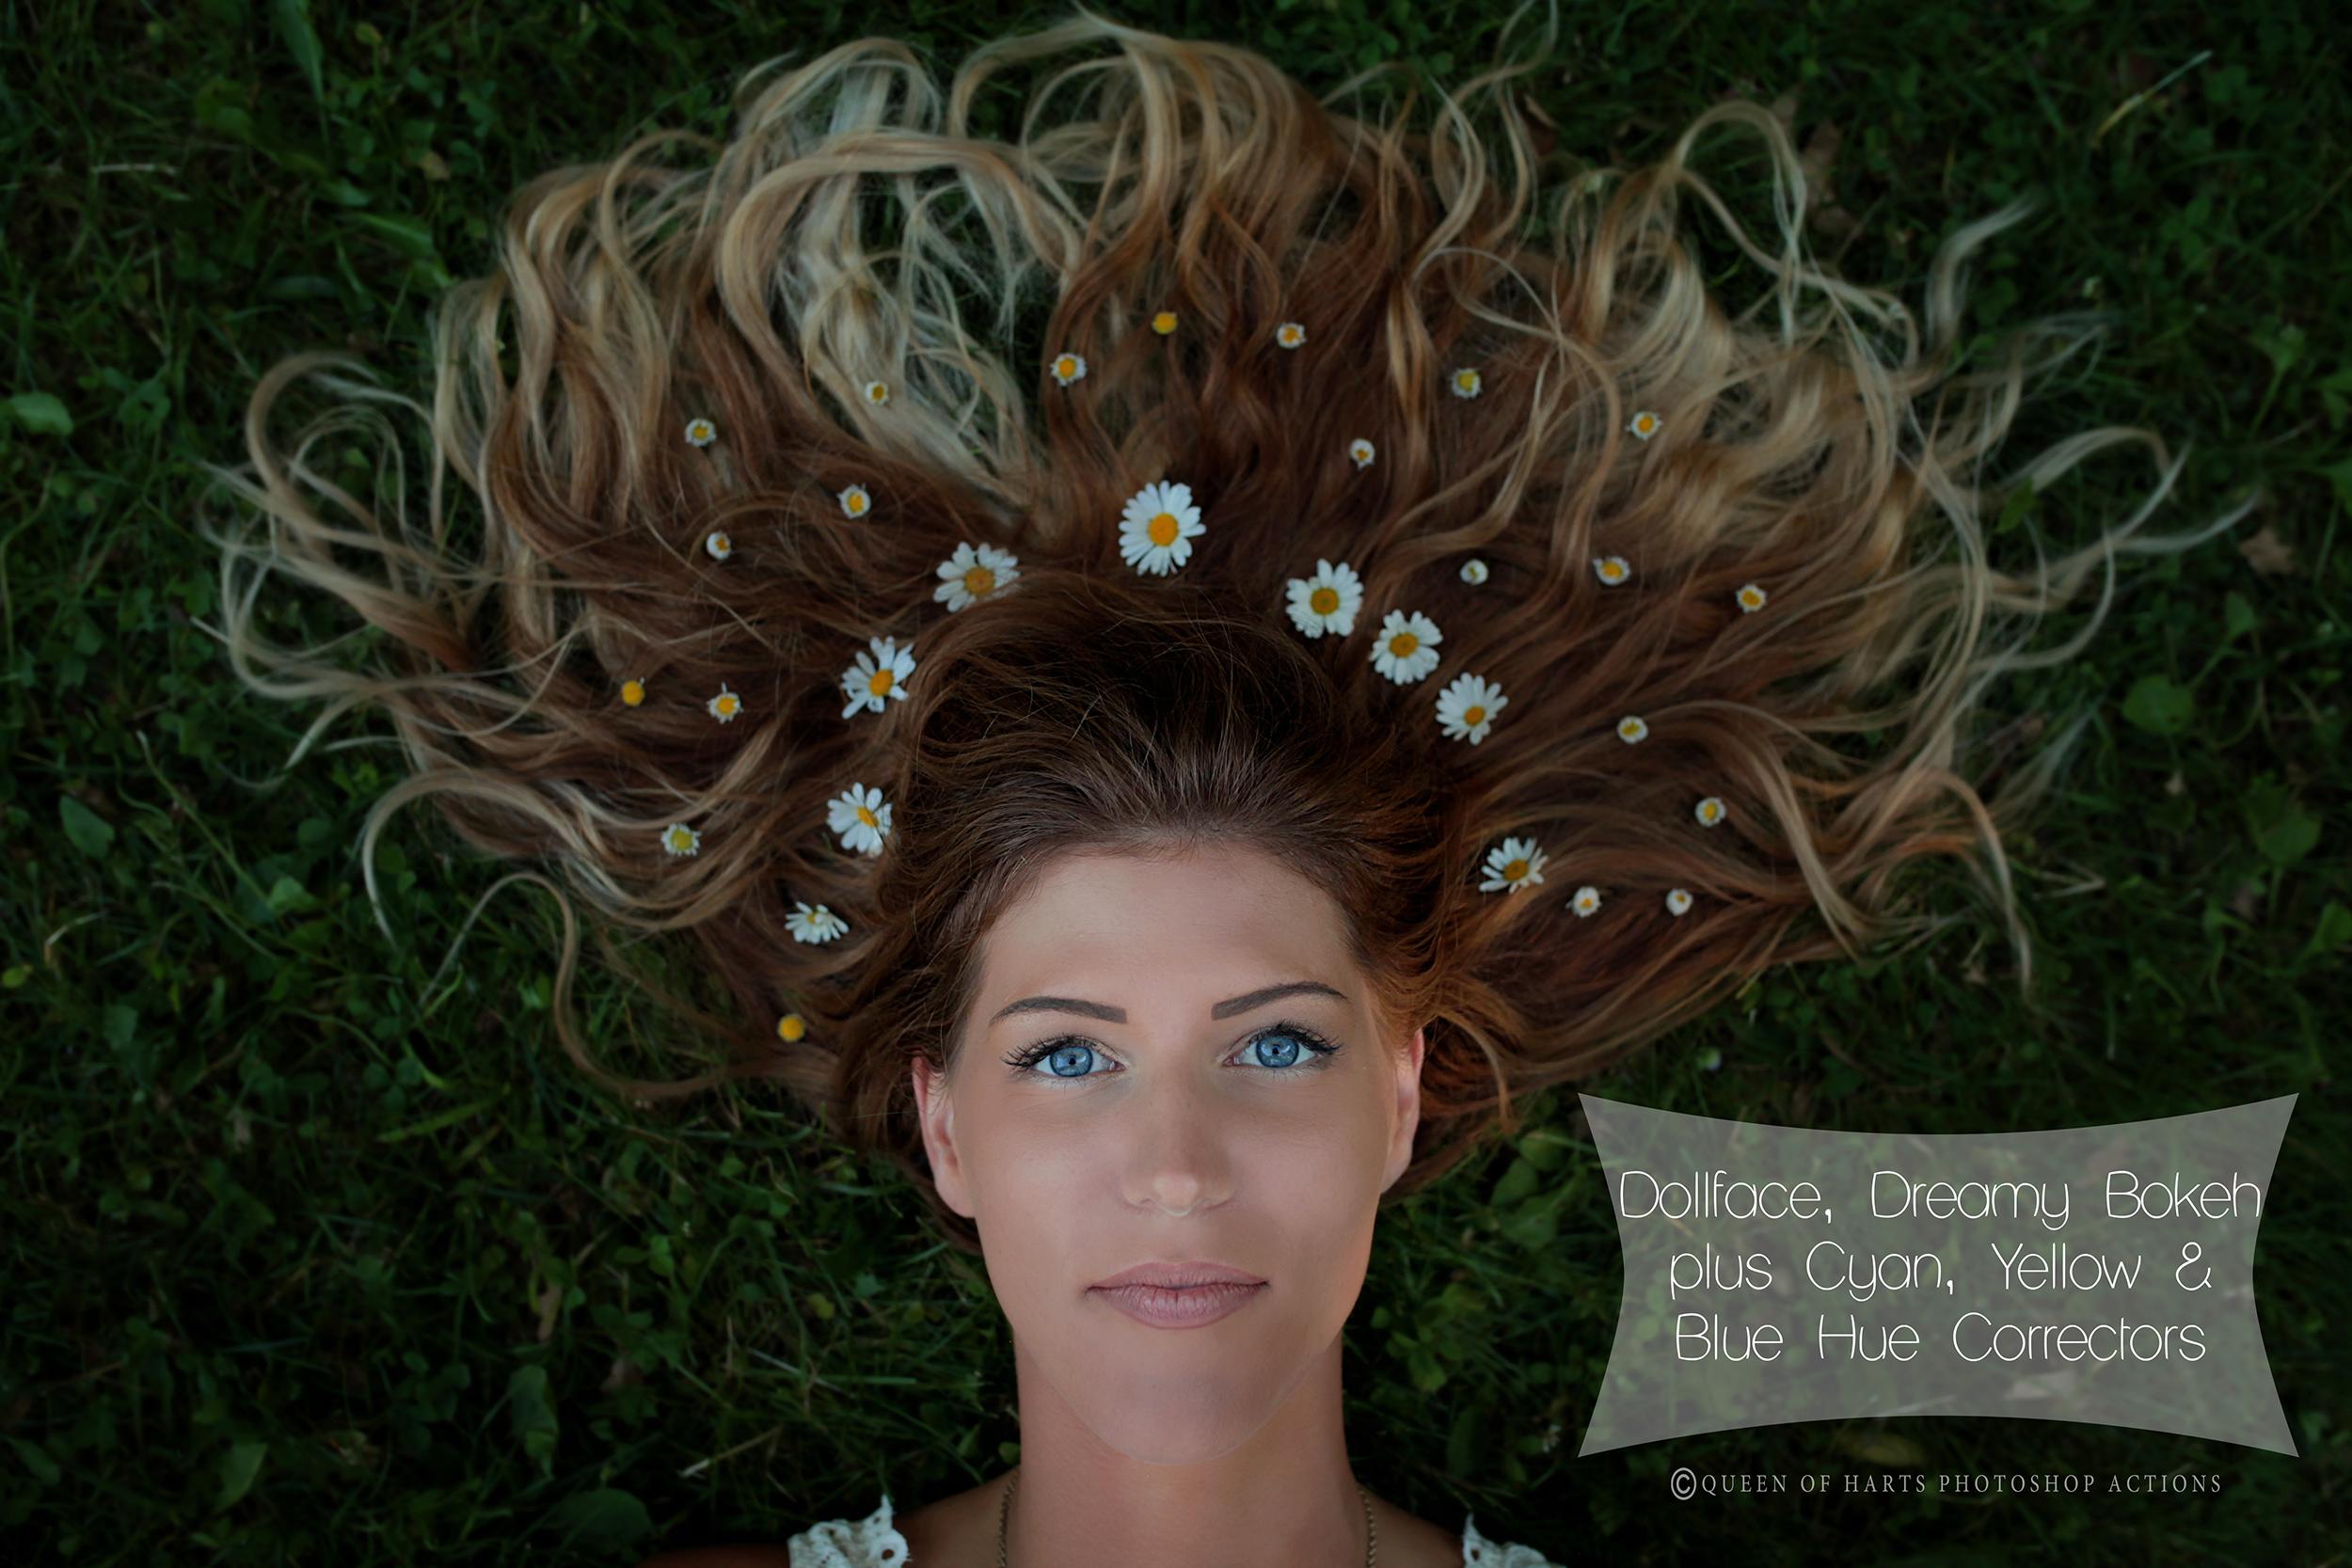 bella photo record 2 actions web.jpg